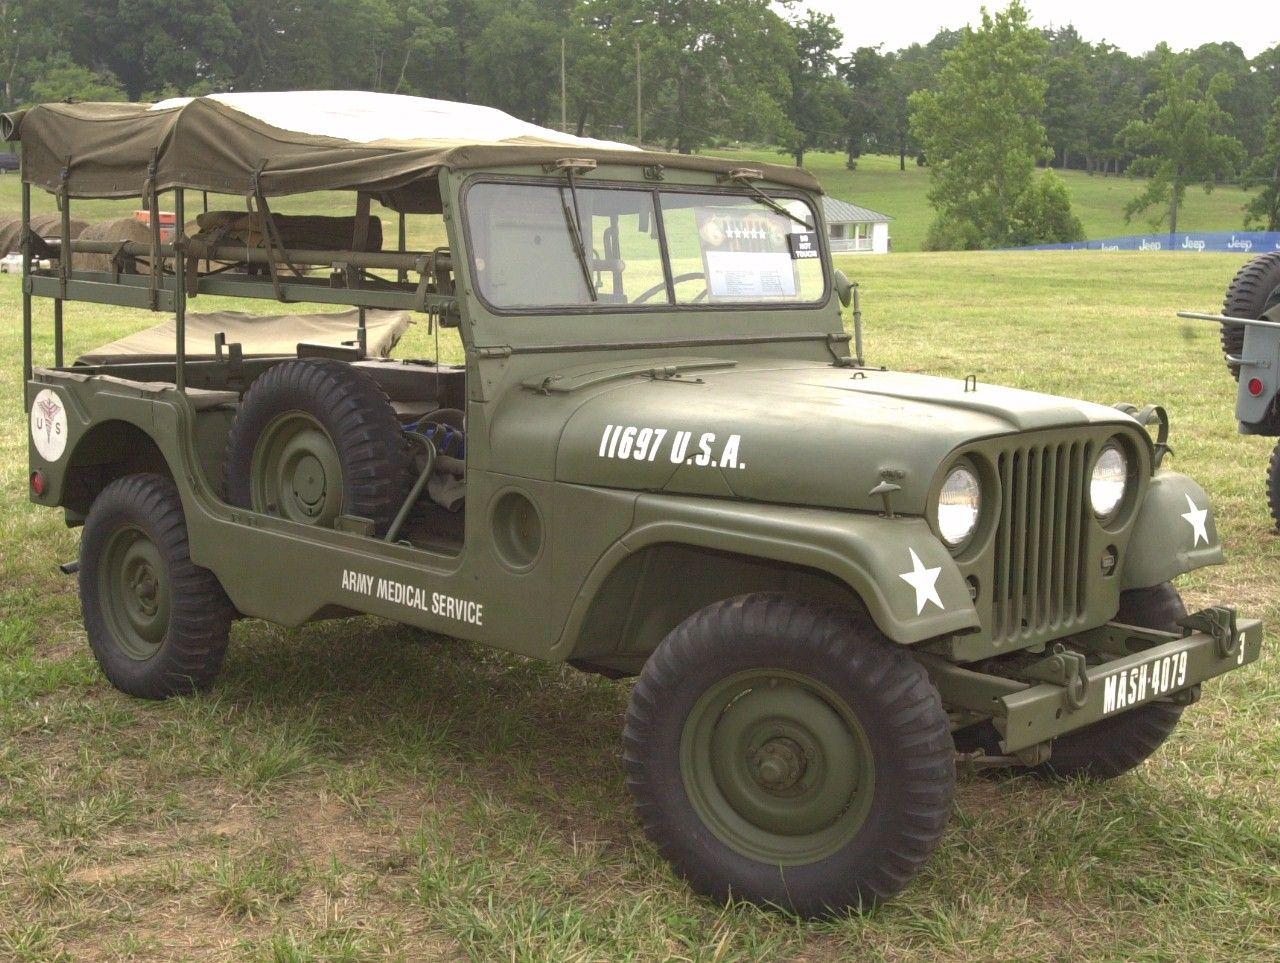 Jeep army medical service m a s h ambulance